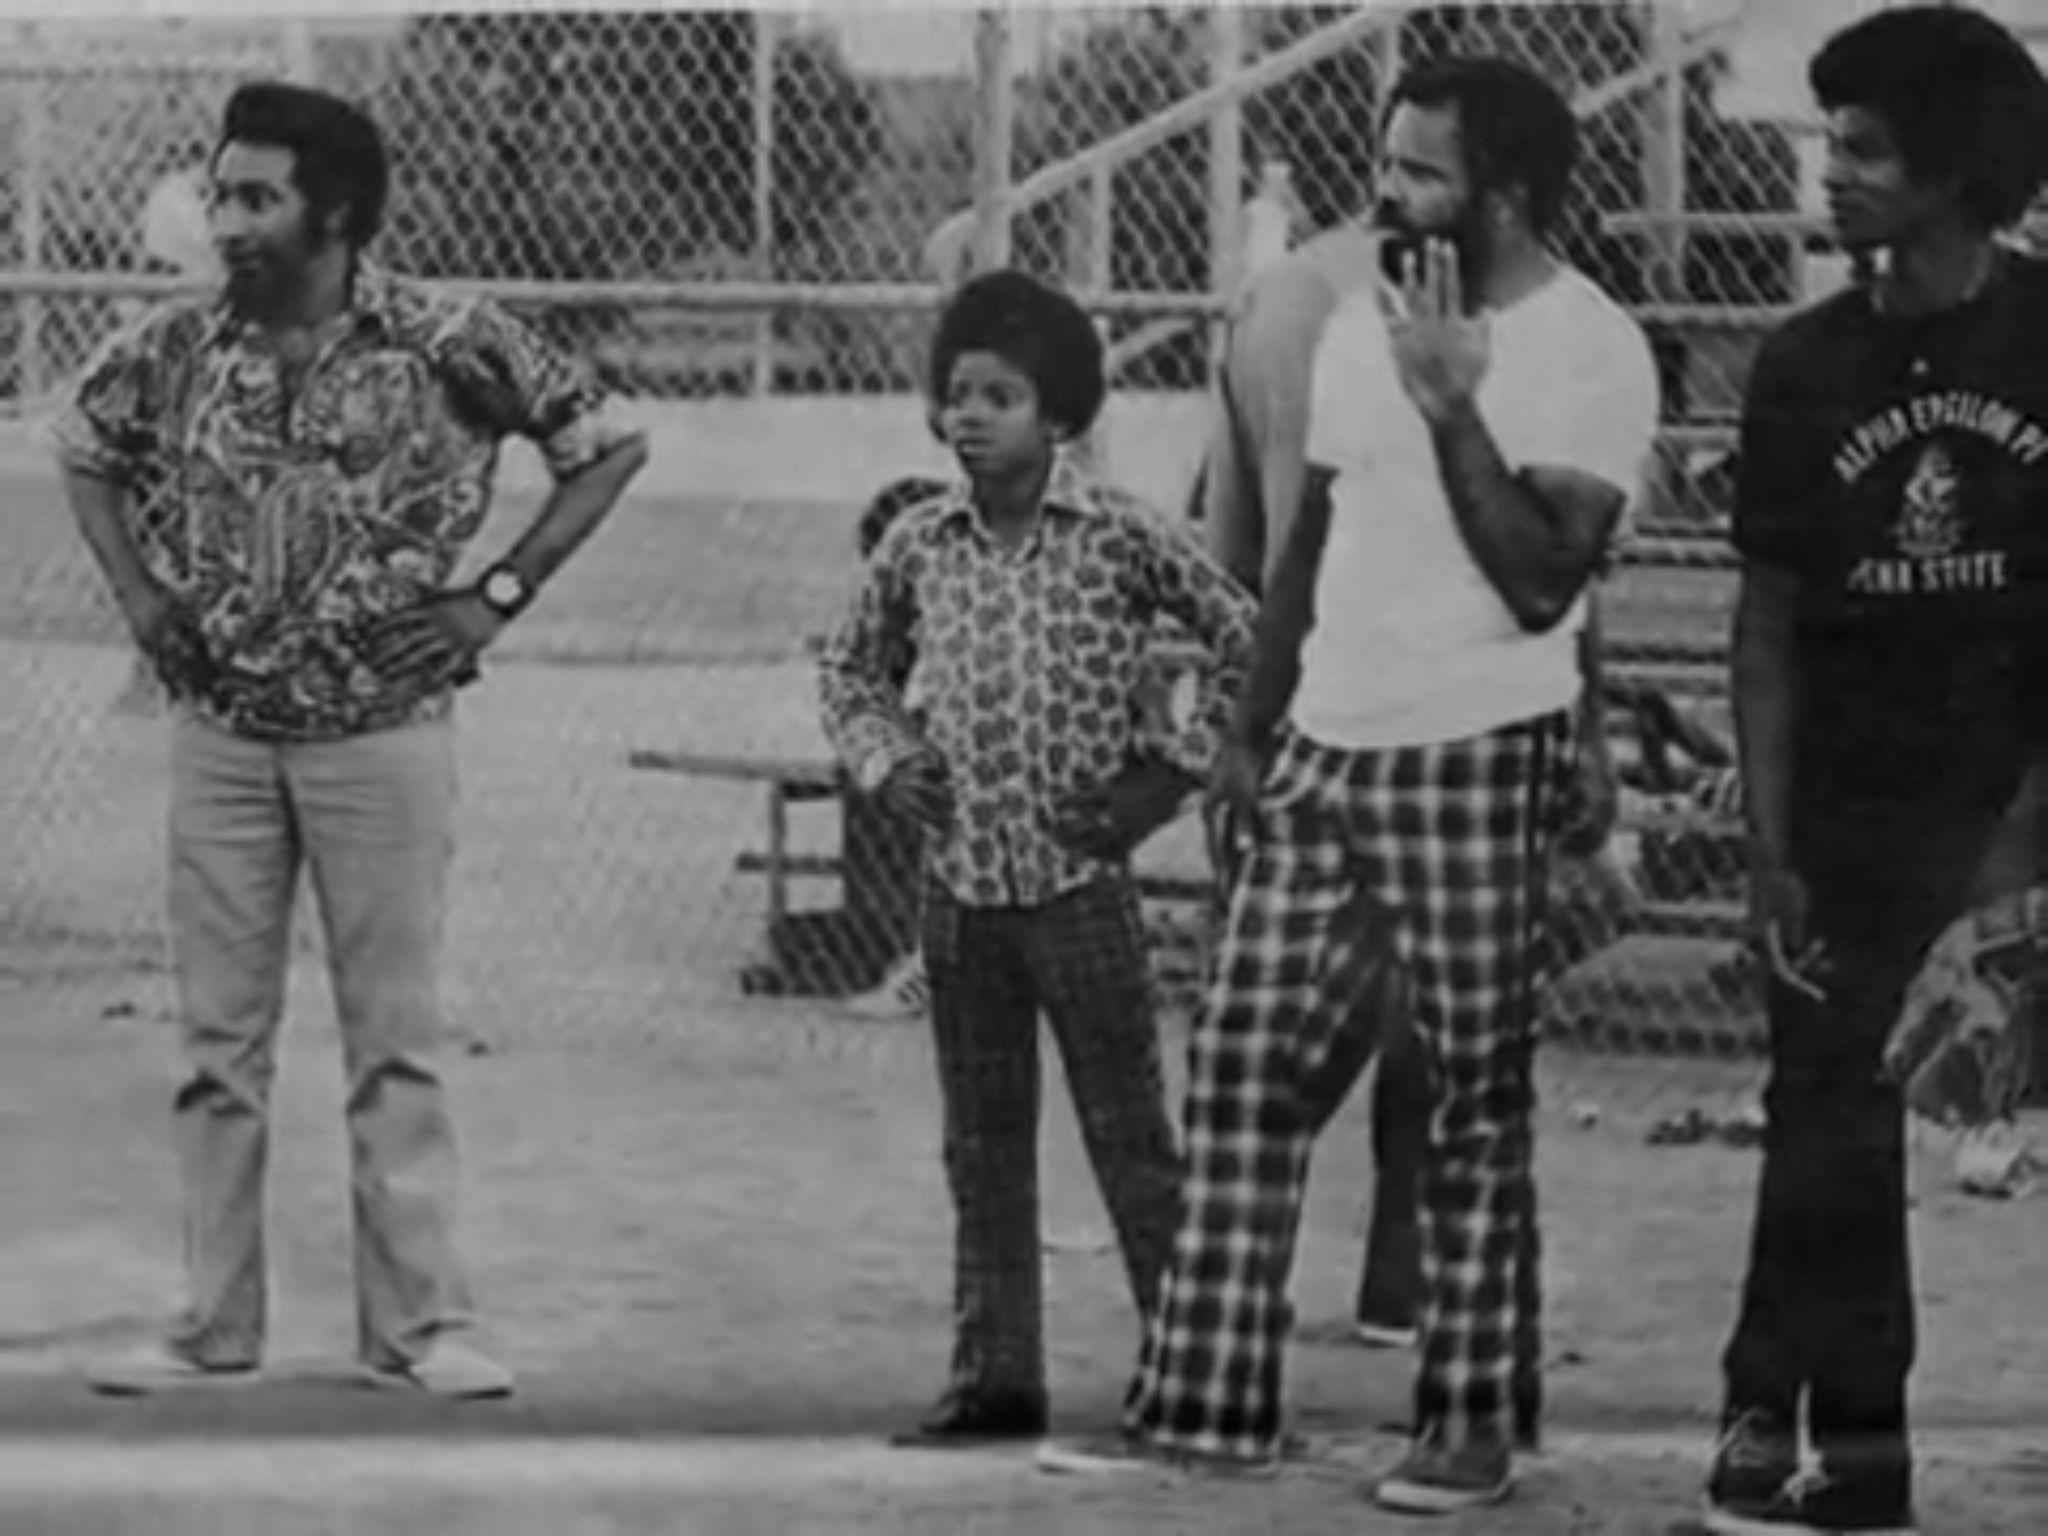 Michael Jackson and his brothers - Jackson 5 Era